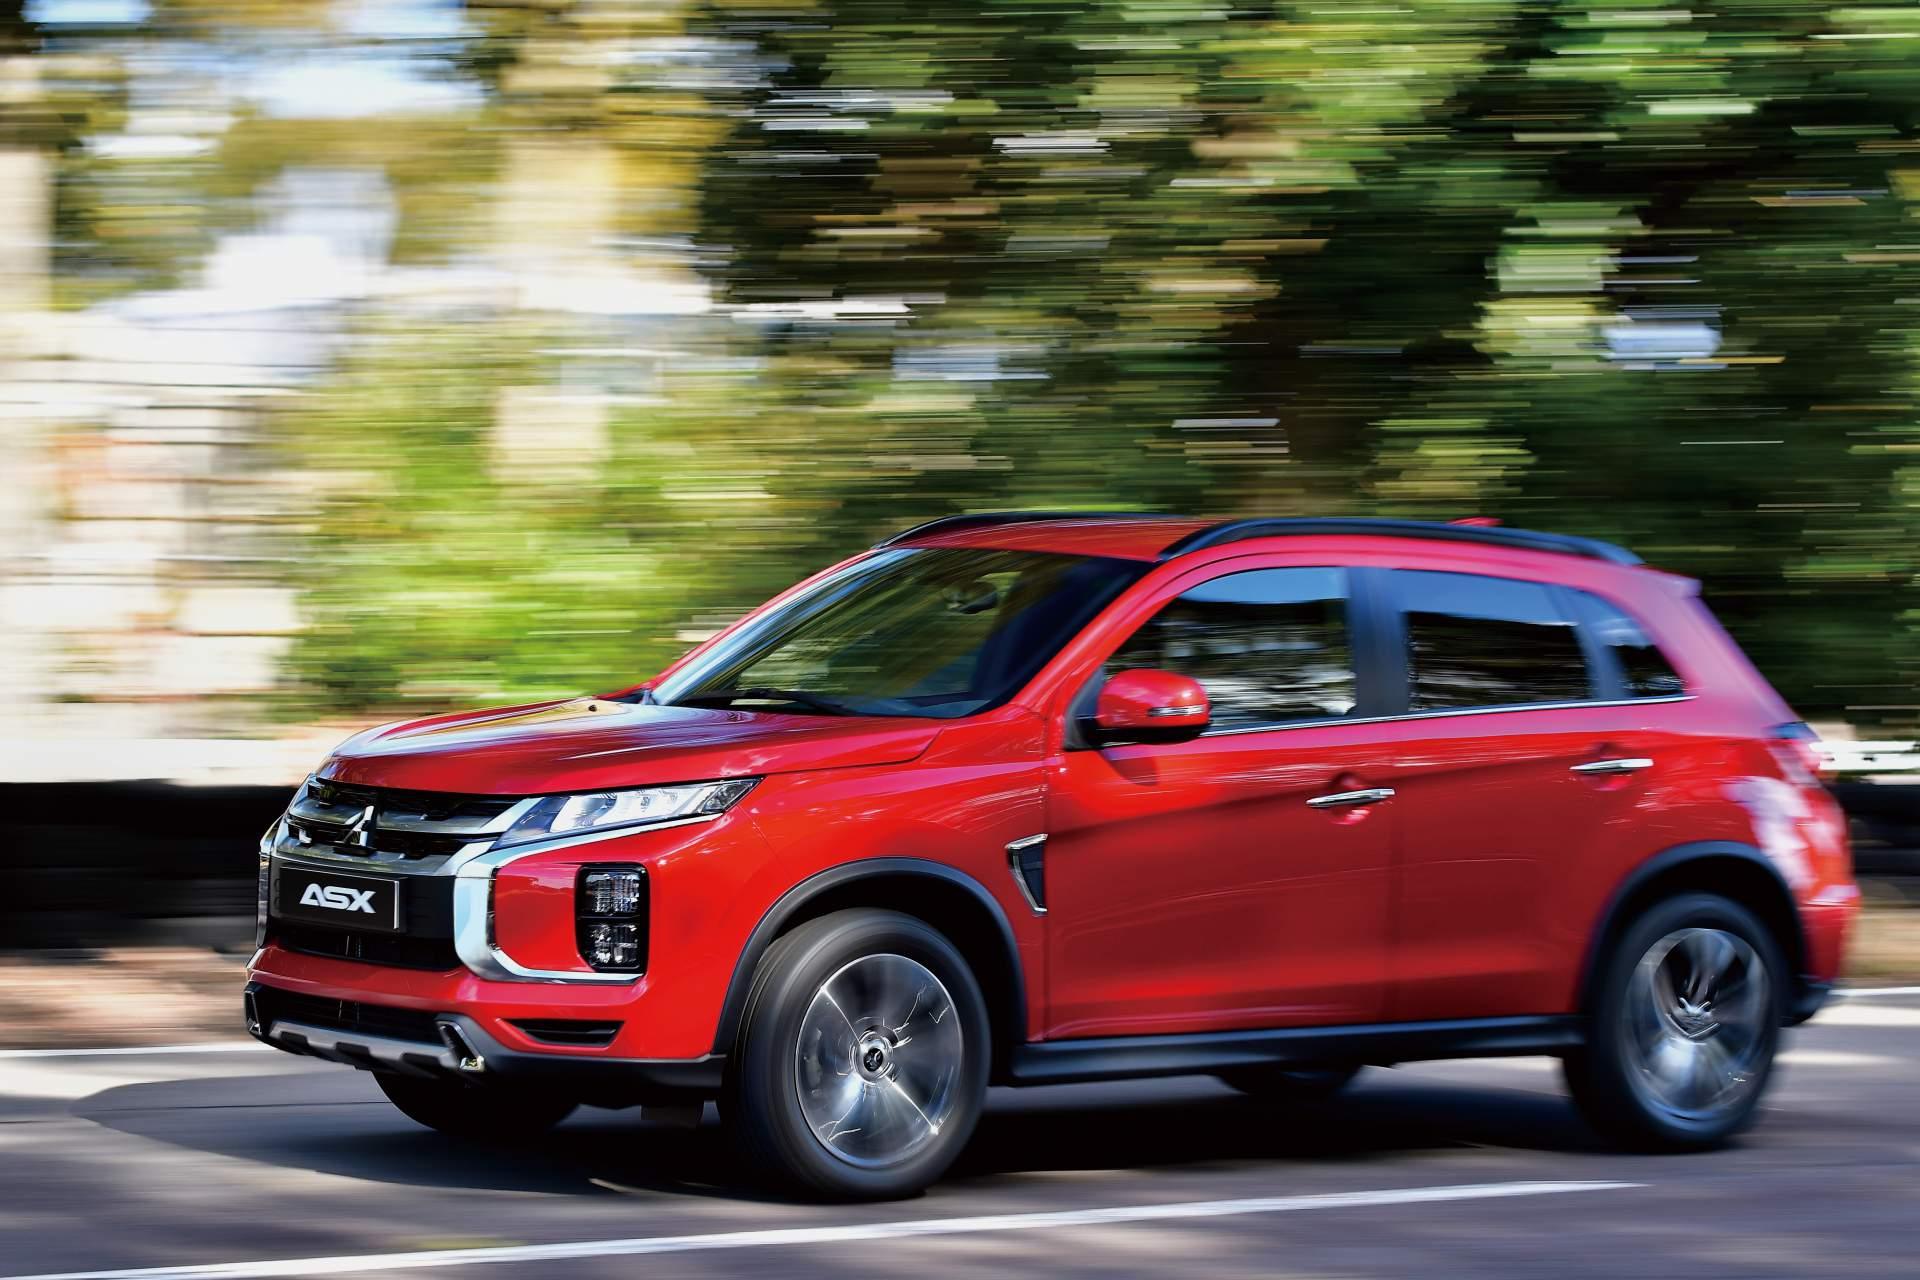 Mitsubishi ASX facelift 2019 (17)